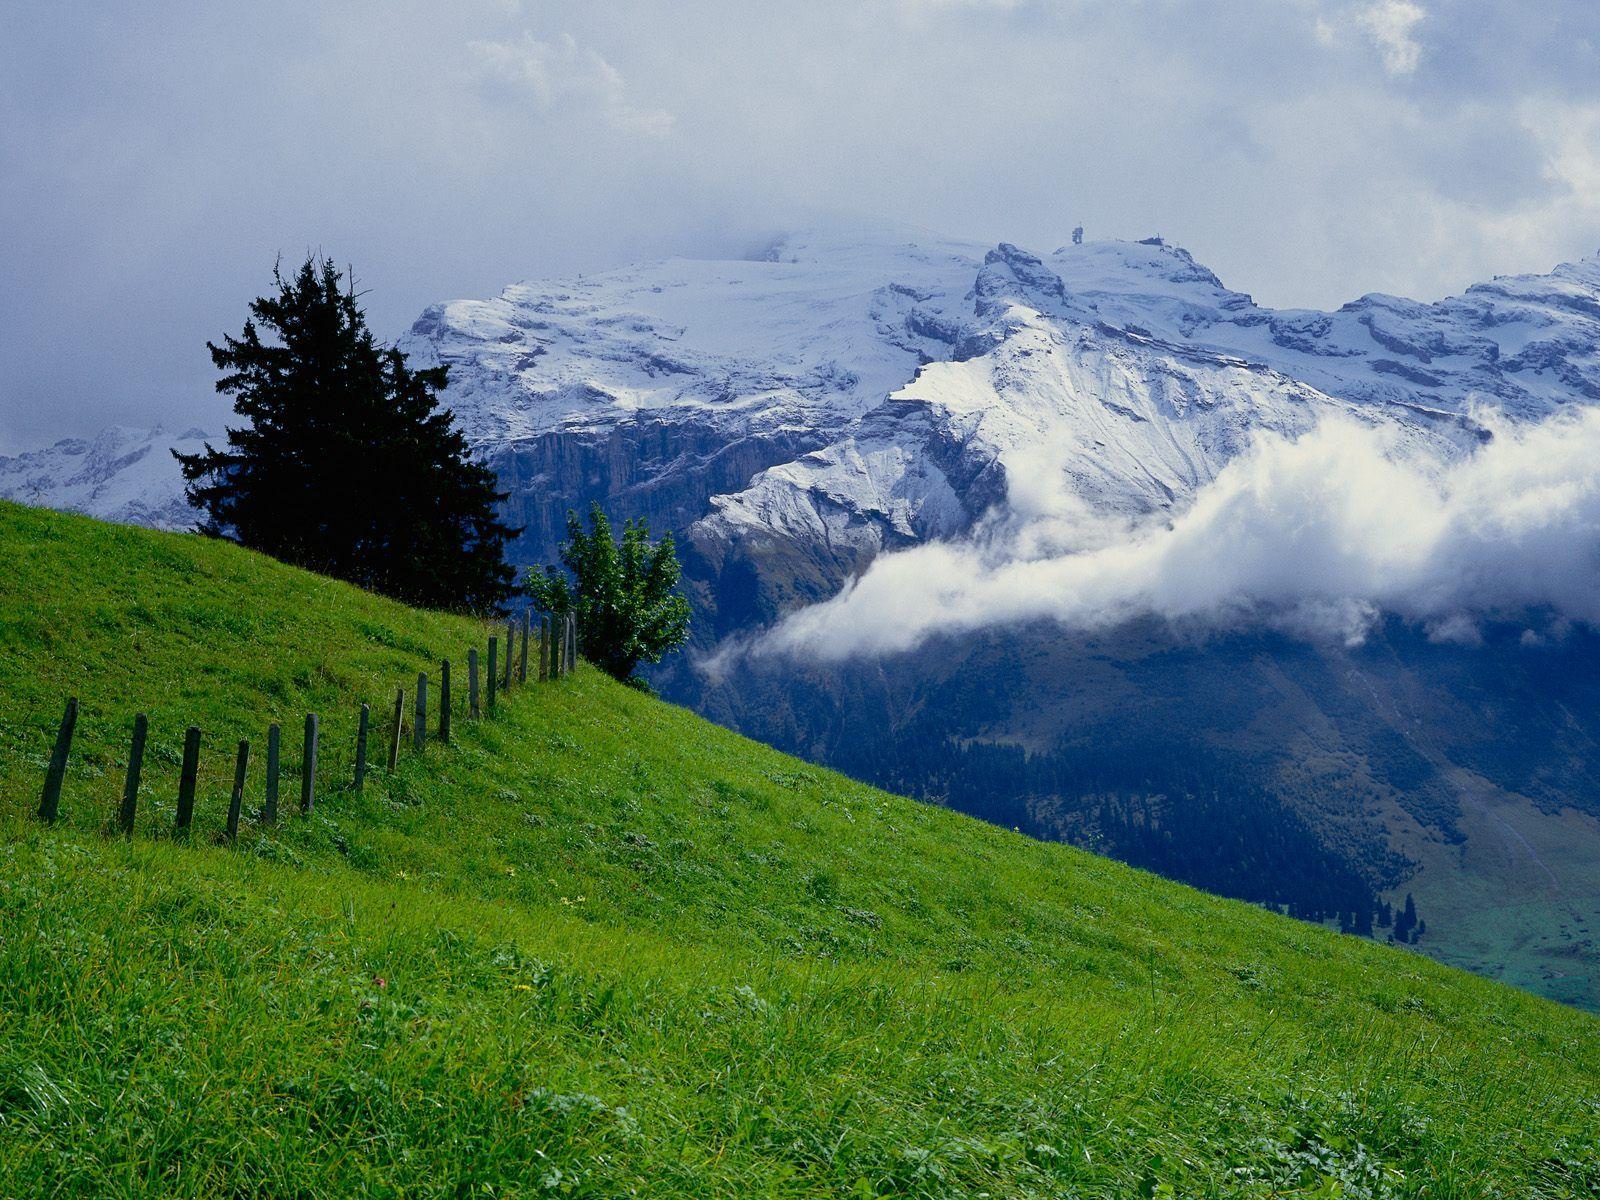 Mount Titlis Obwalden Switzerland Absolutely Breathtaking Switzerland Wallpaper Beautiful Landscapes Hd Nature Wallpapers